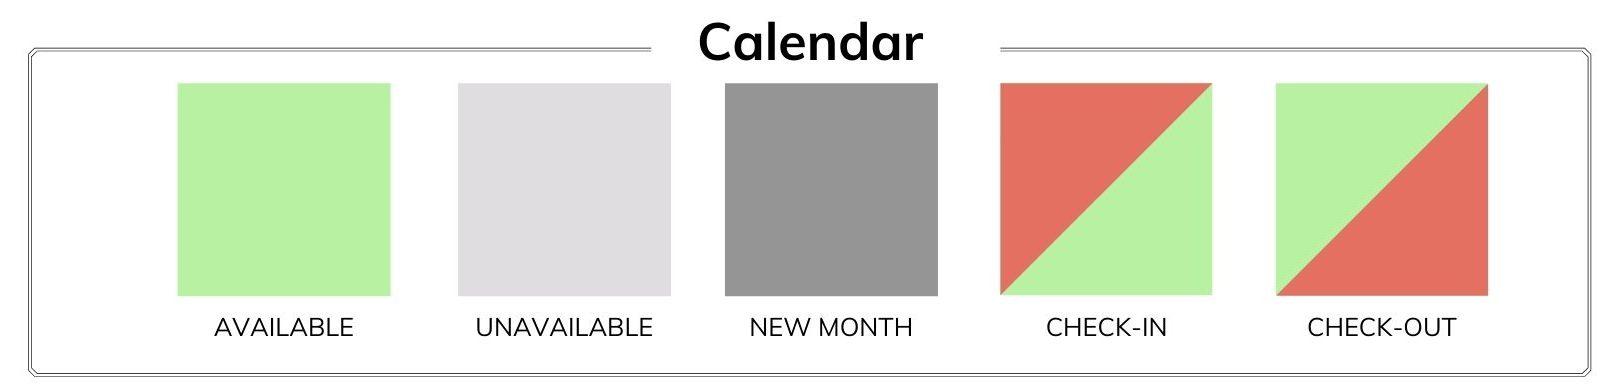 Calendar meanings